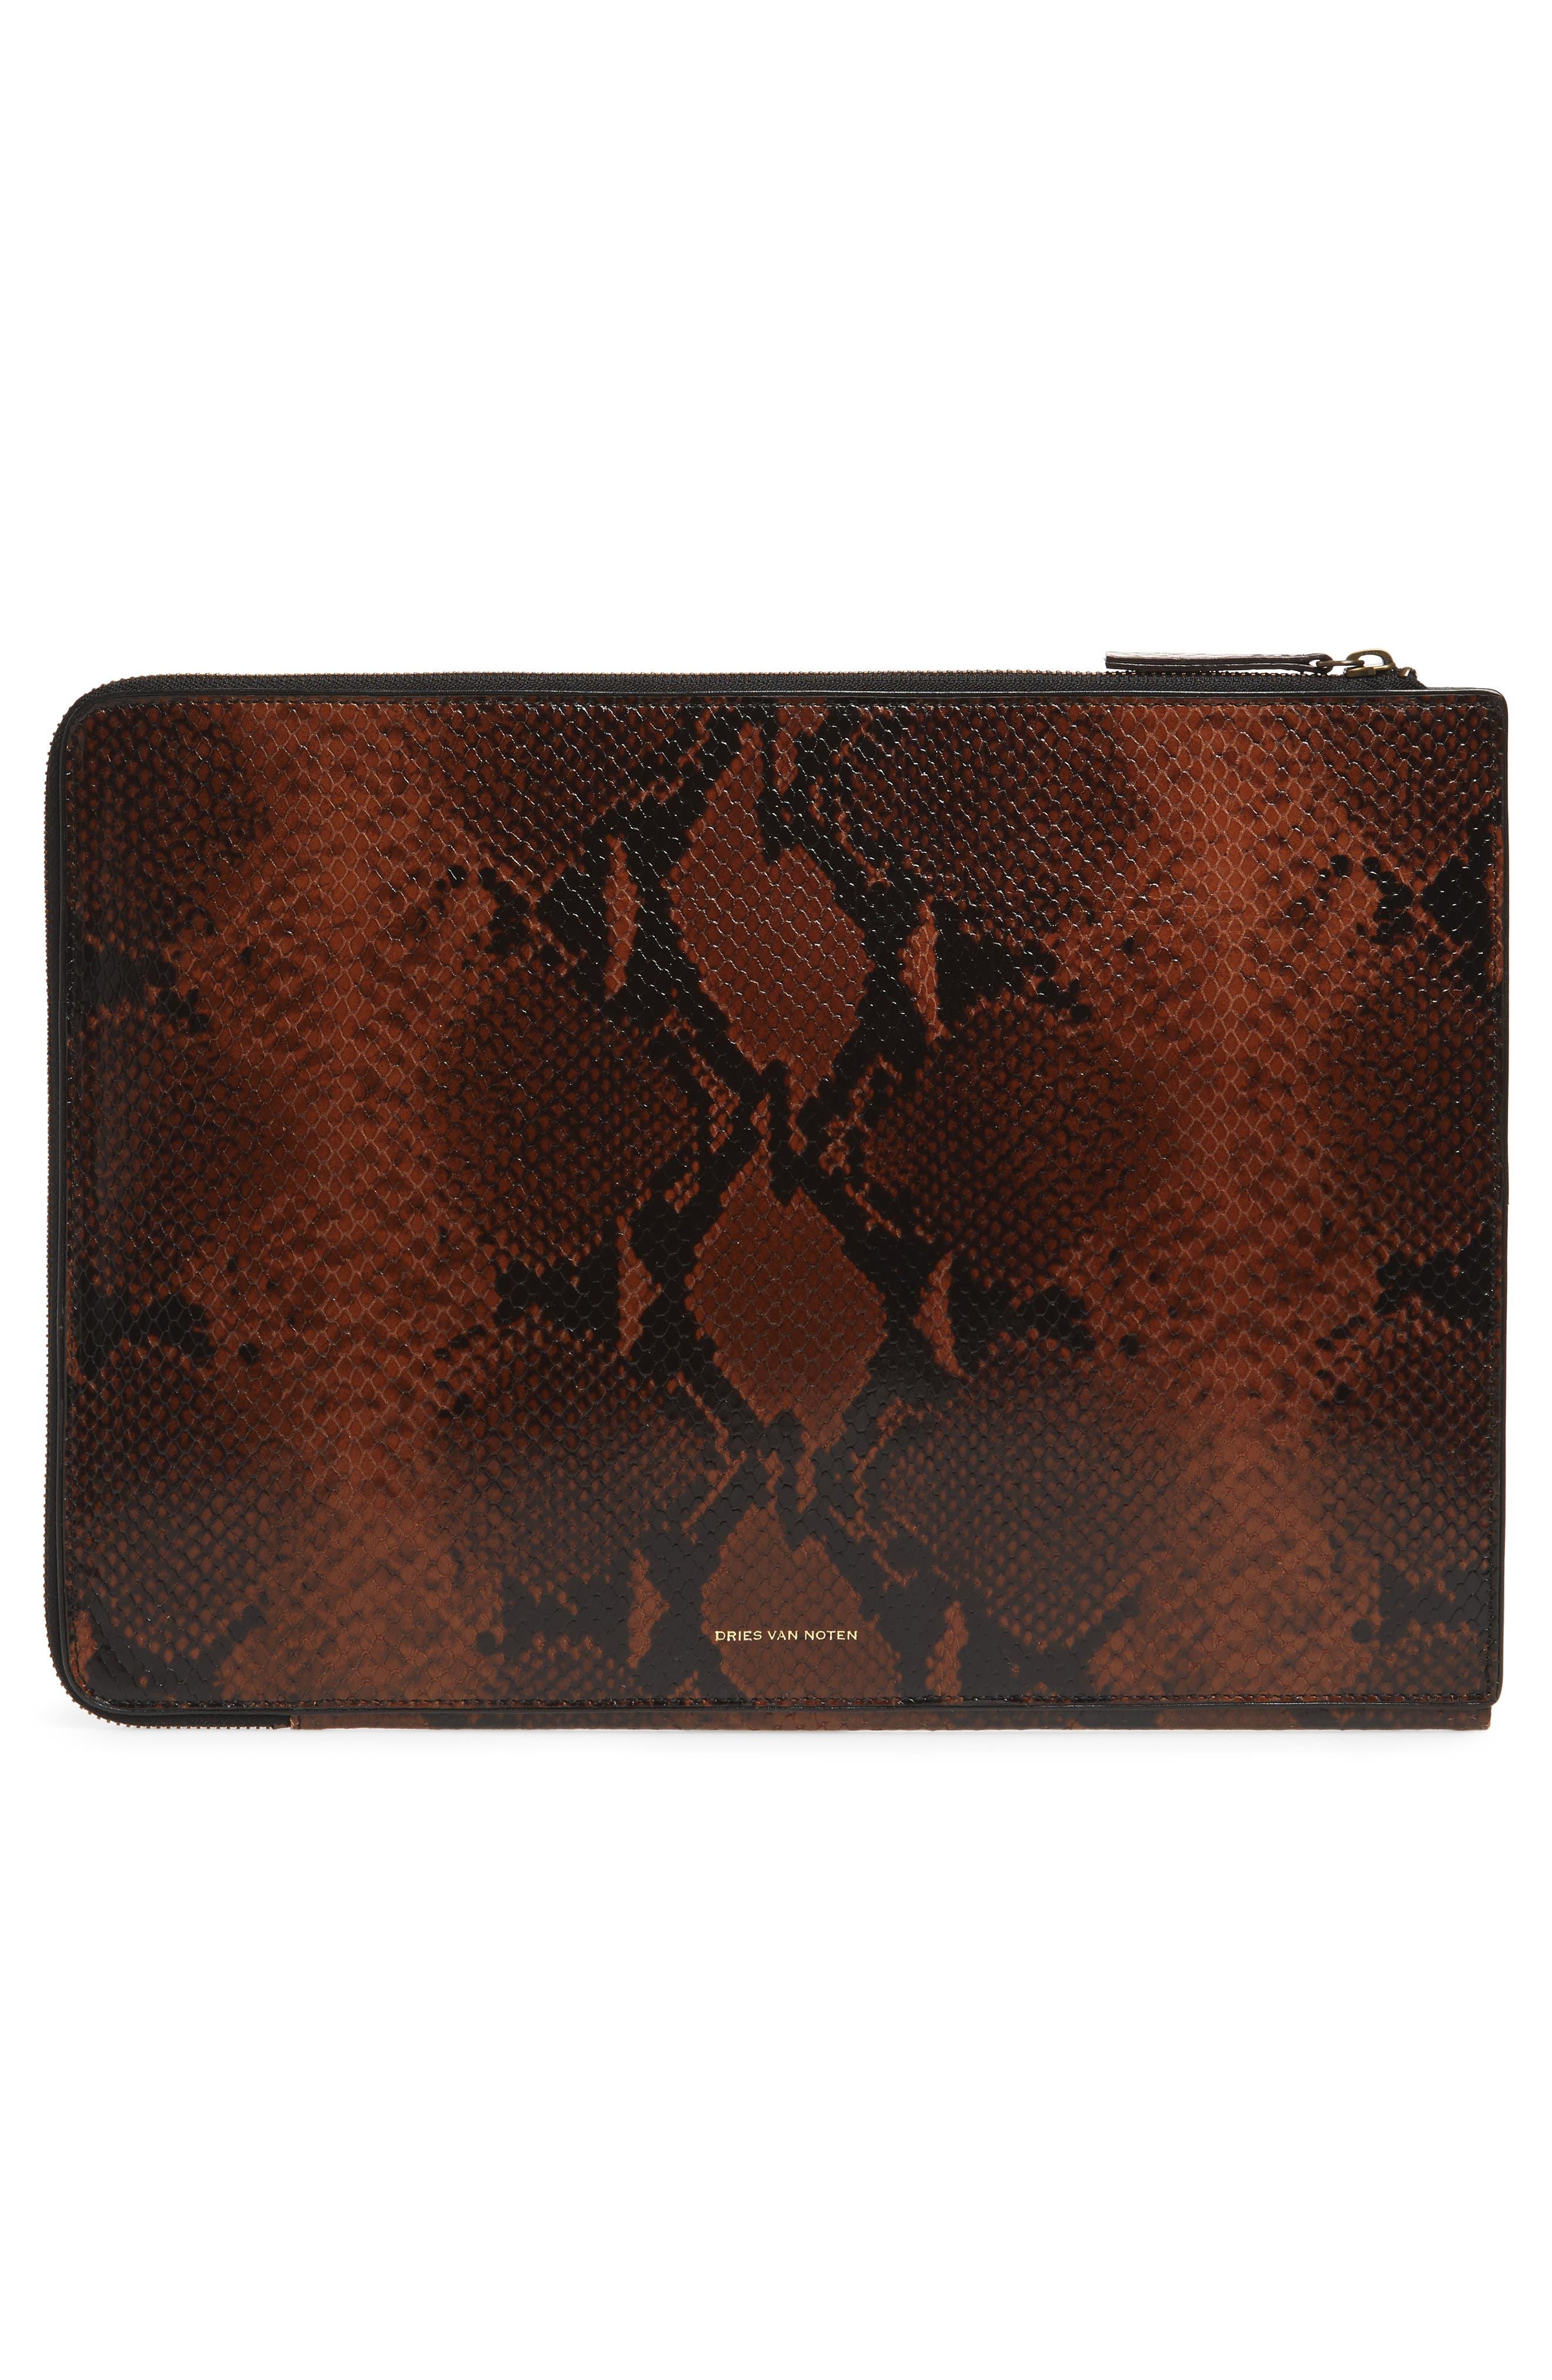 Leather Laptop Sleeve,                             Alternate thumbnail 4, color,                             200